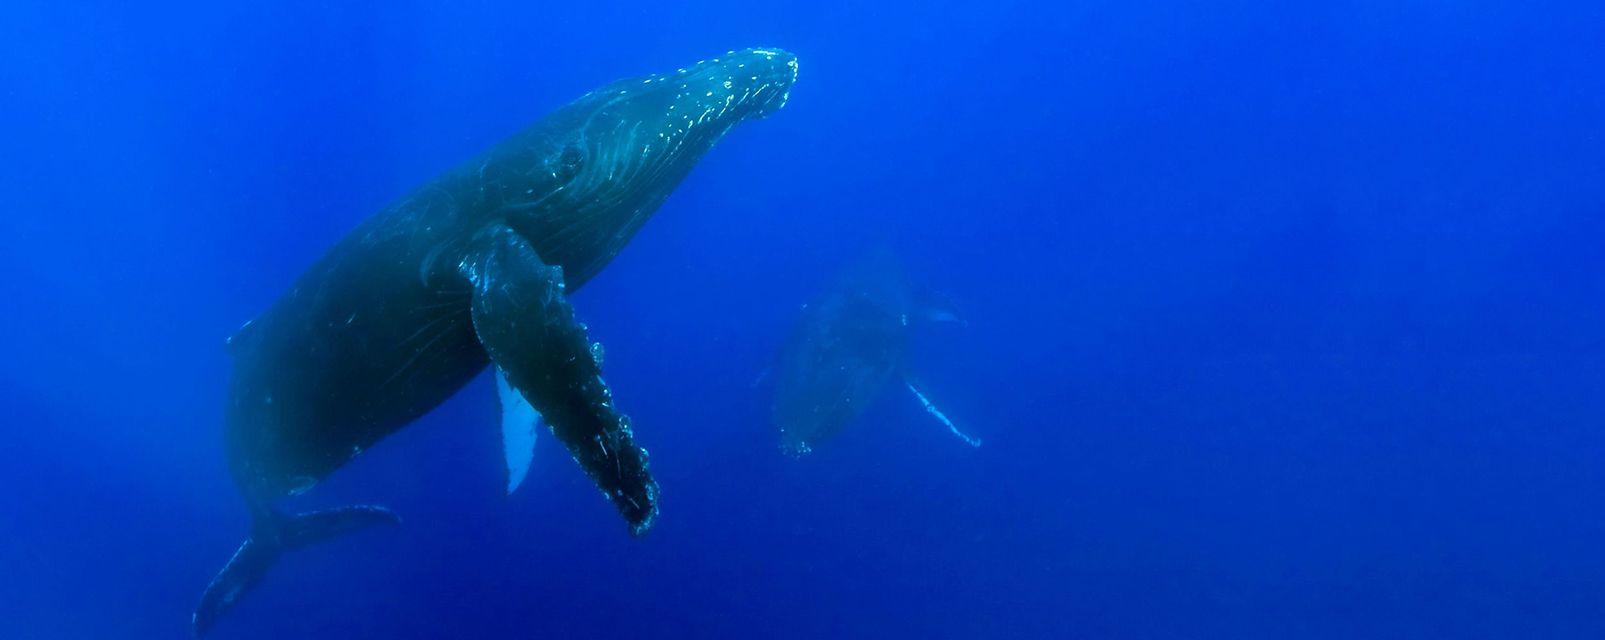 , La fauna, Fauna y flora, Hawaï